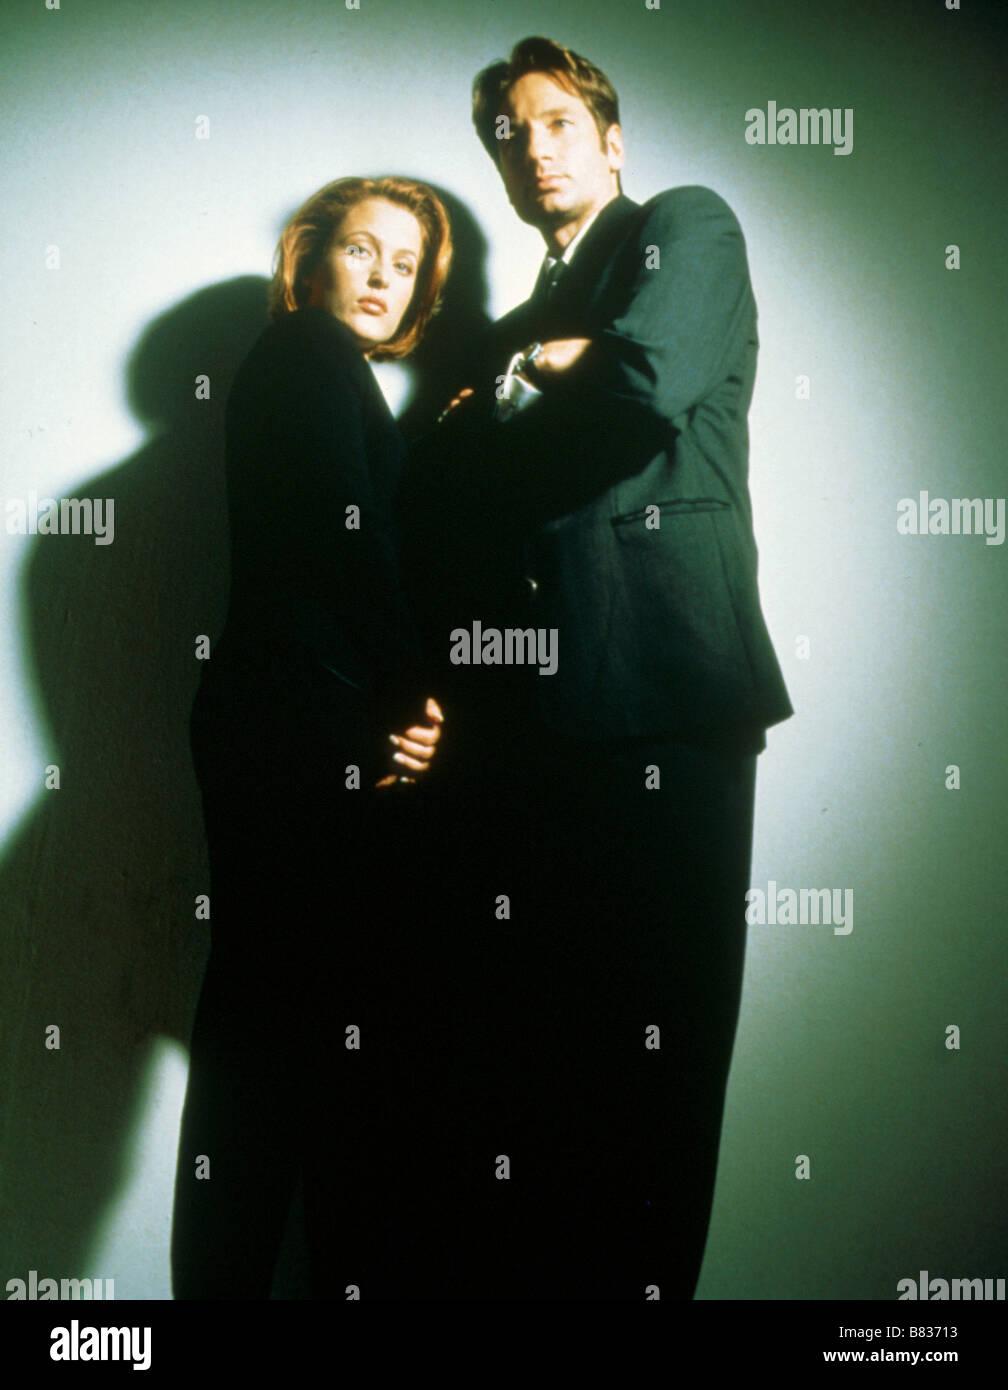 X-Files #37 VF 1998 Stock Image